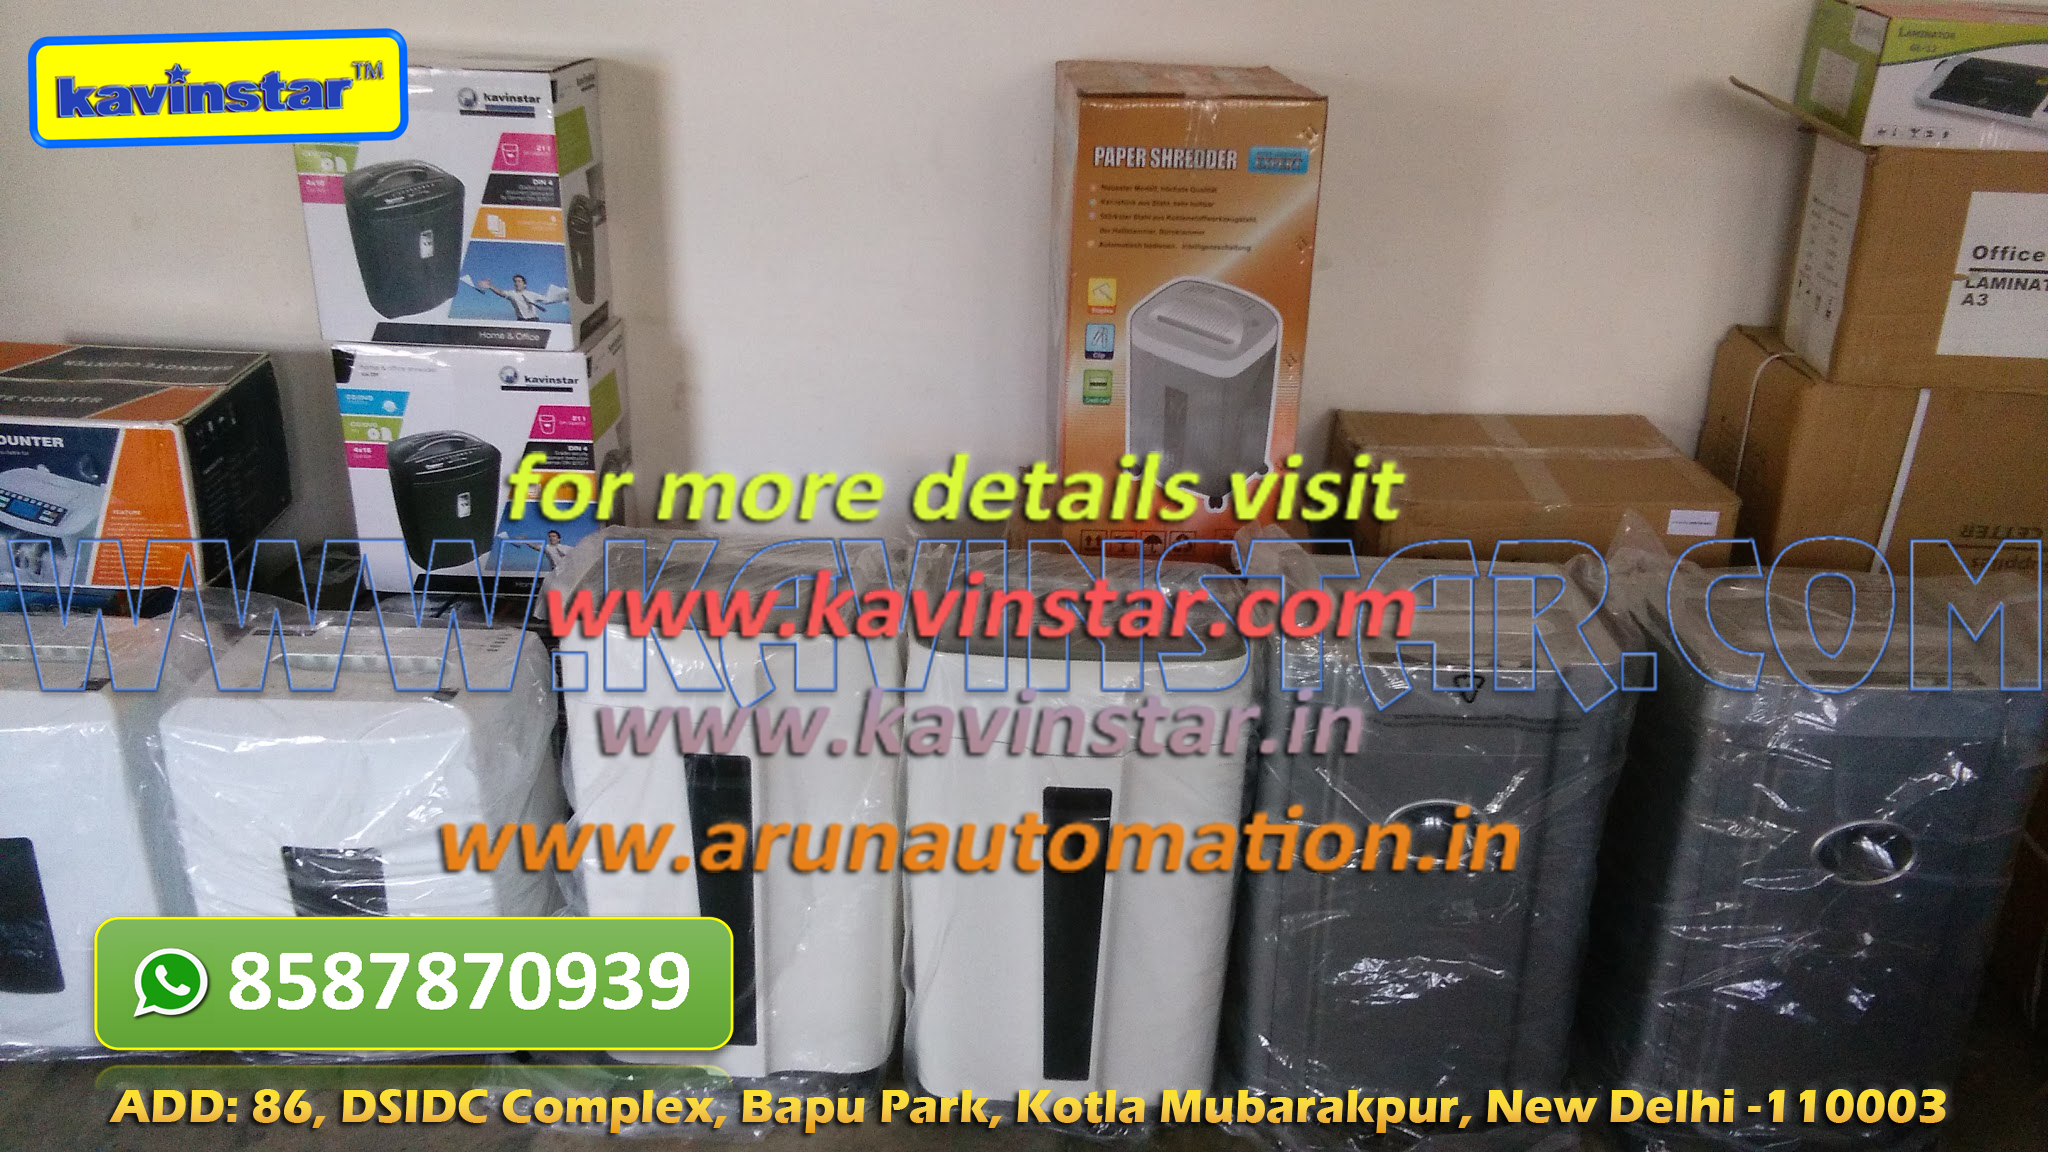 36 Office Furniture Dealer In Gurgaon Order Aluminium Picnic Table Call 09716585310